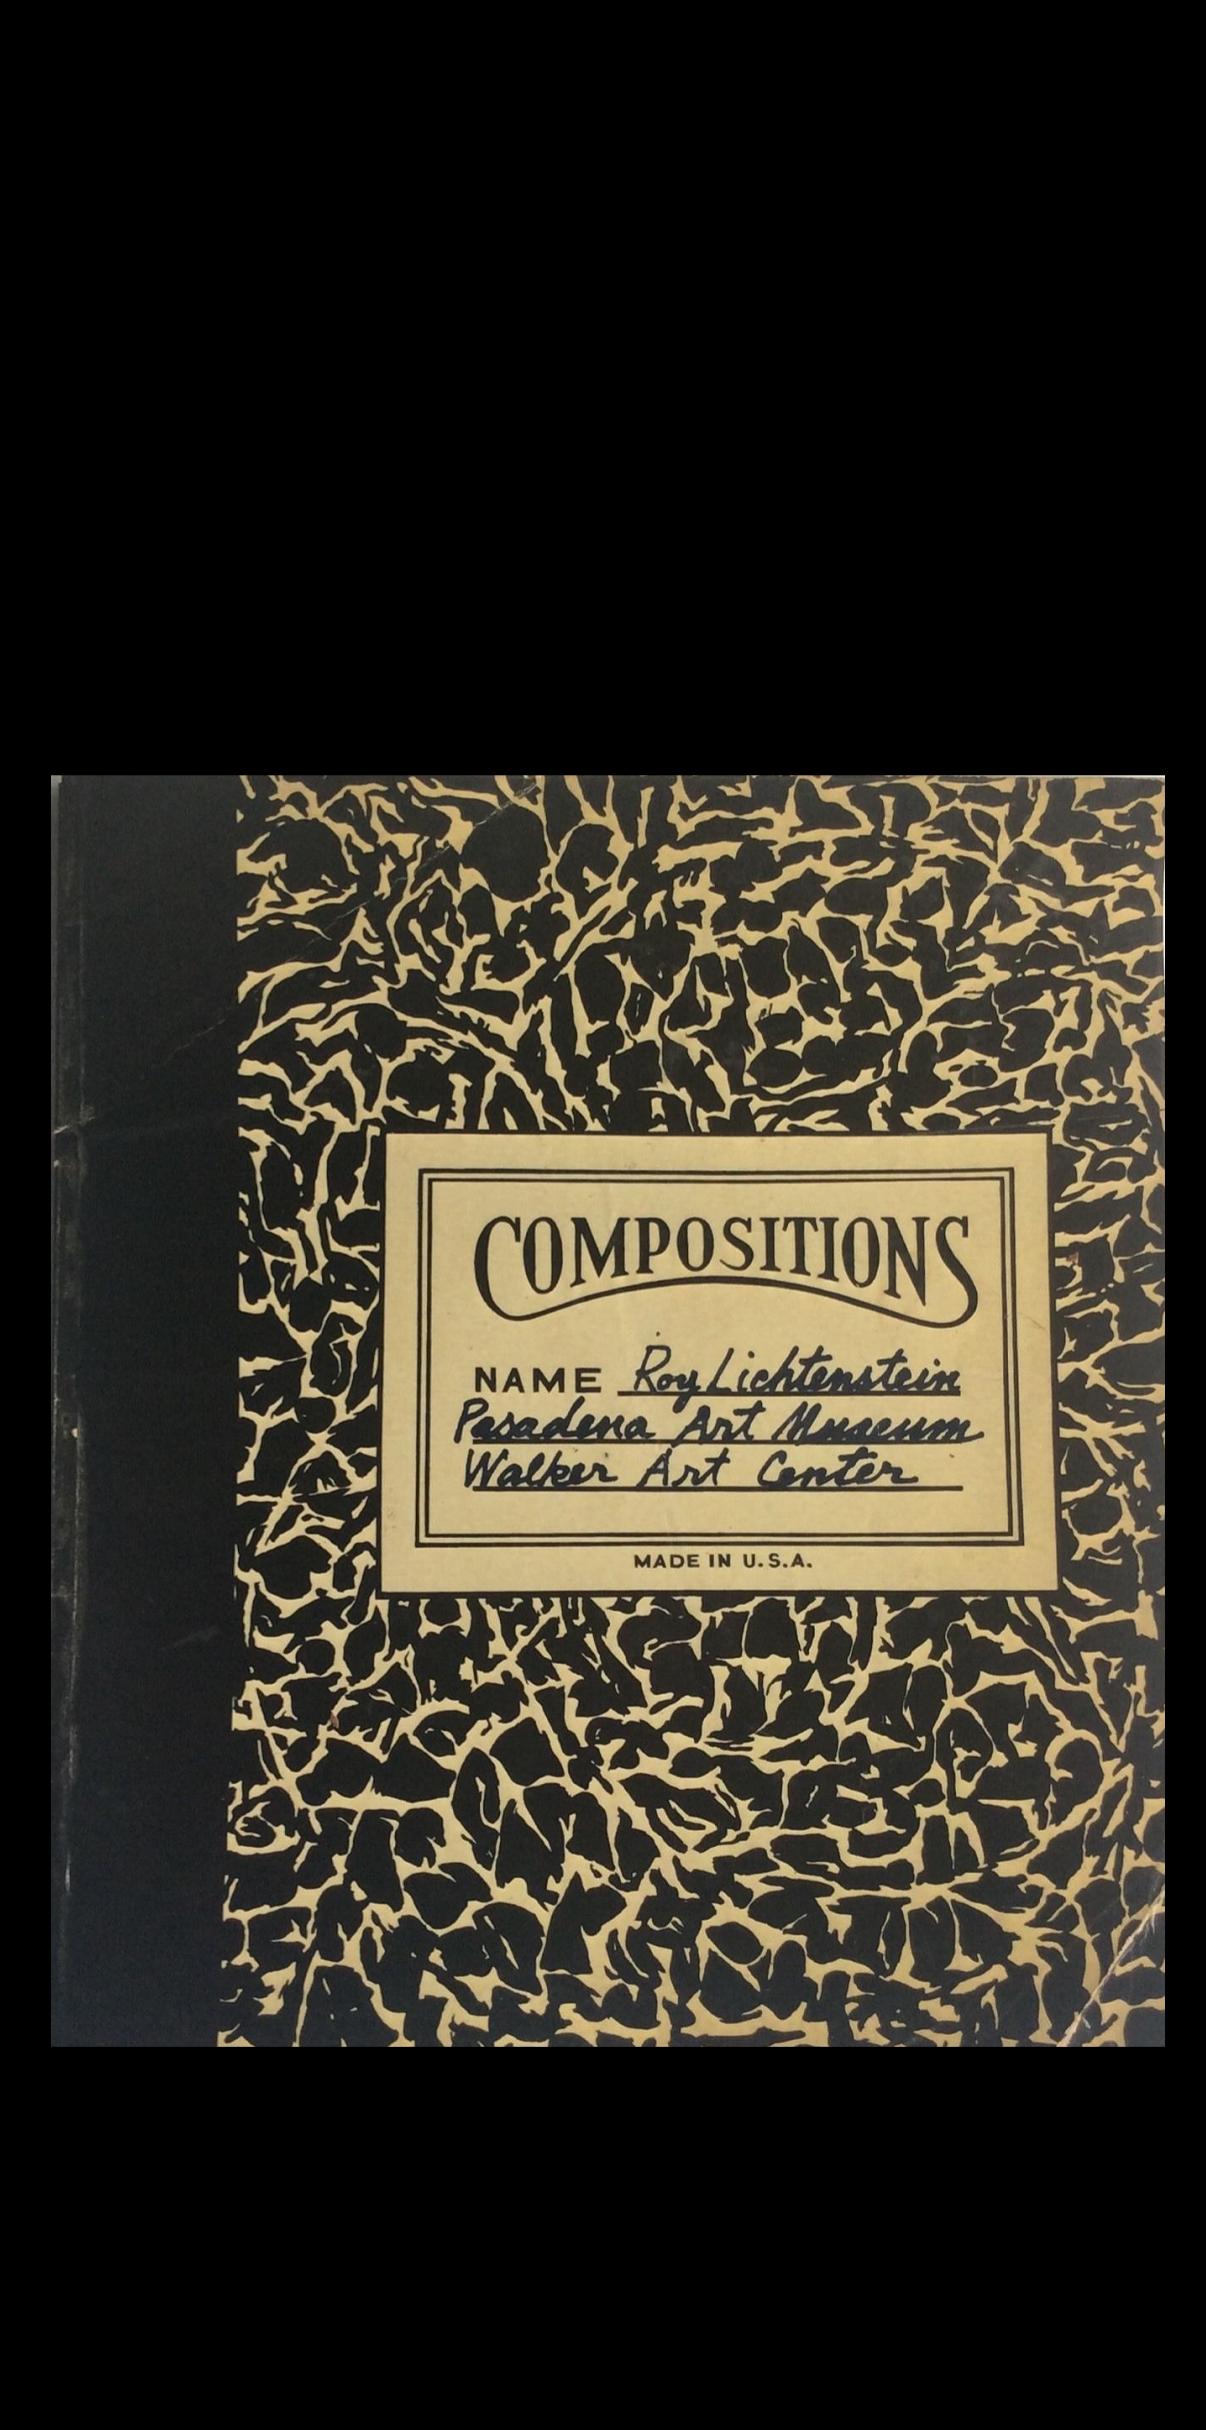 """Compositions"", 1967,  Exhibition Catalogue, Pasadena Art Museum."